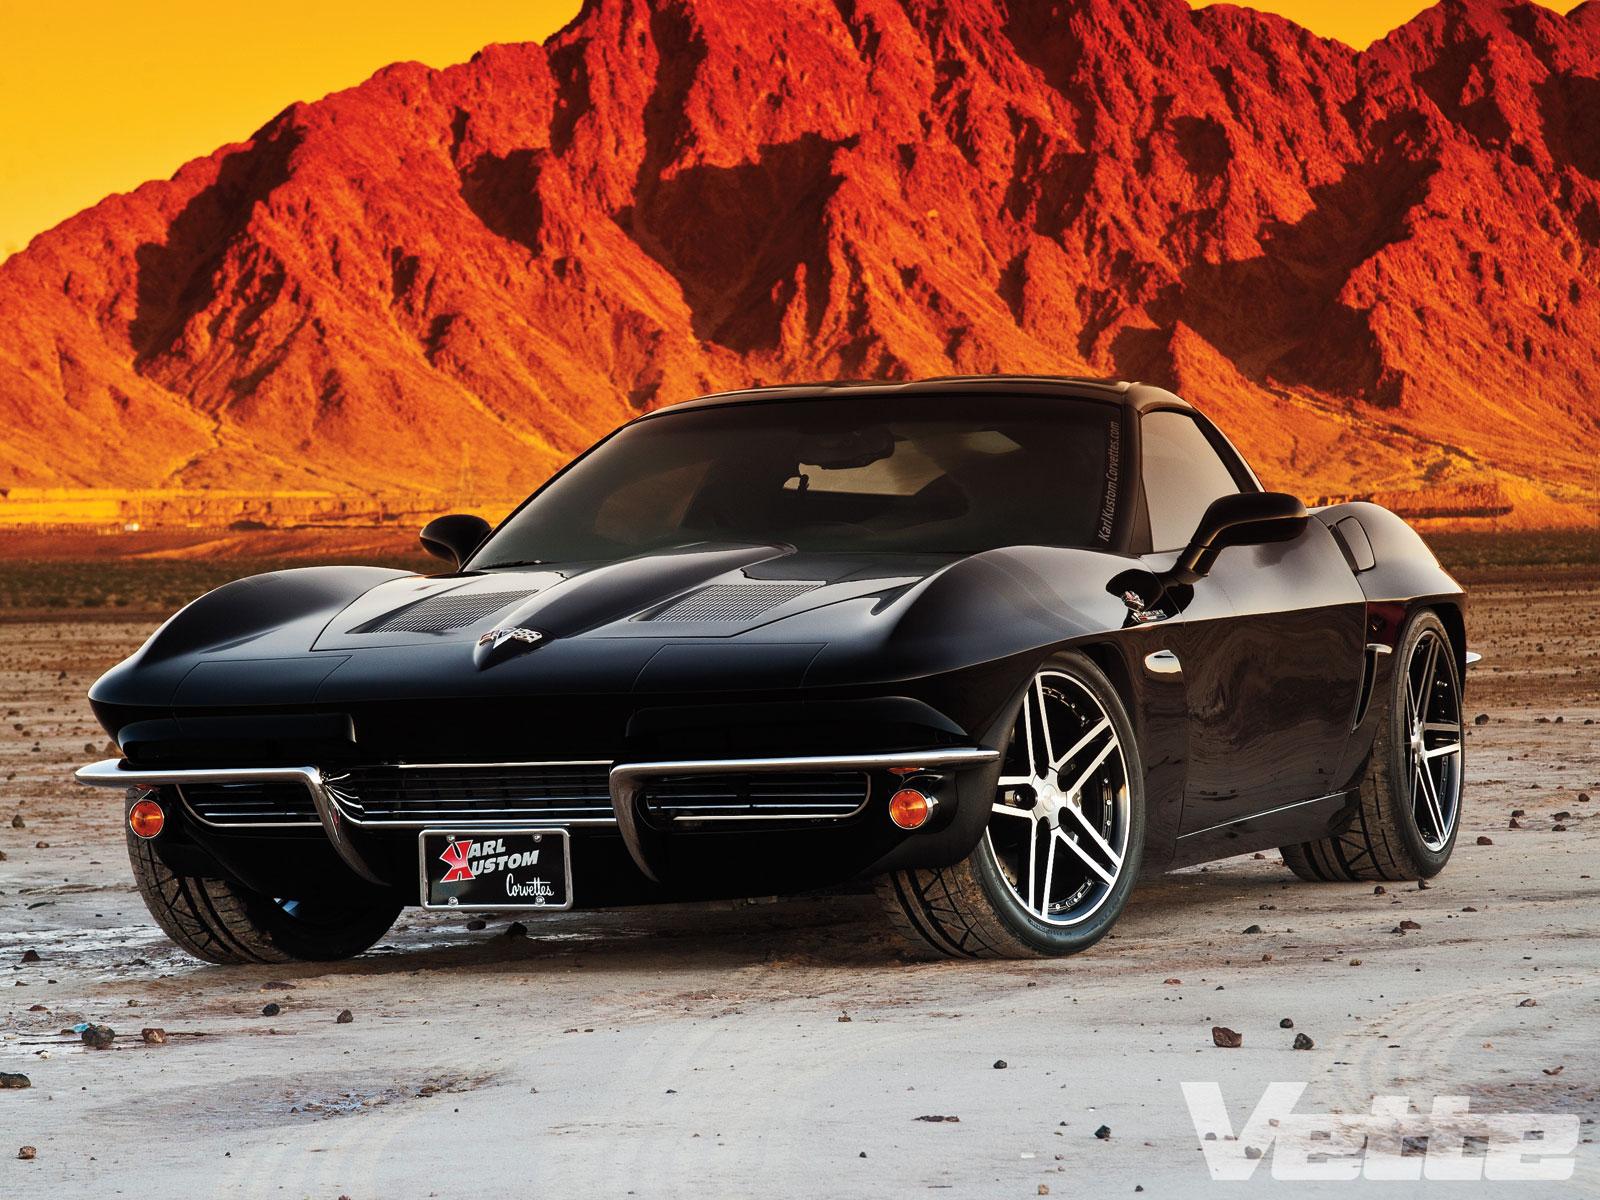 Car Window Wallpaper Chevrolet Corvette 470px Image 11